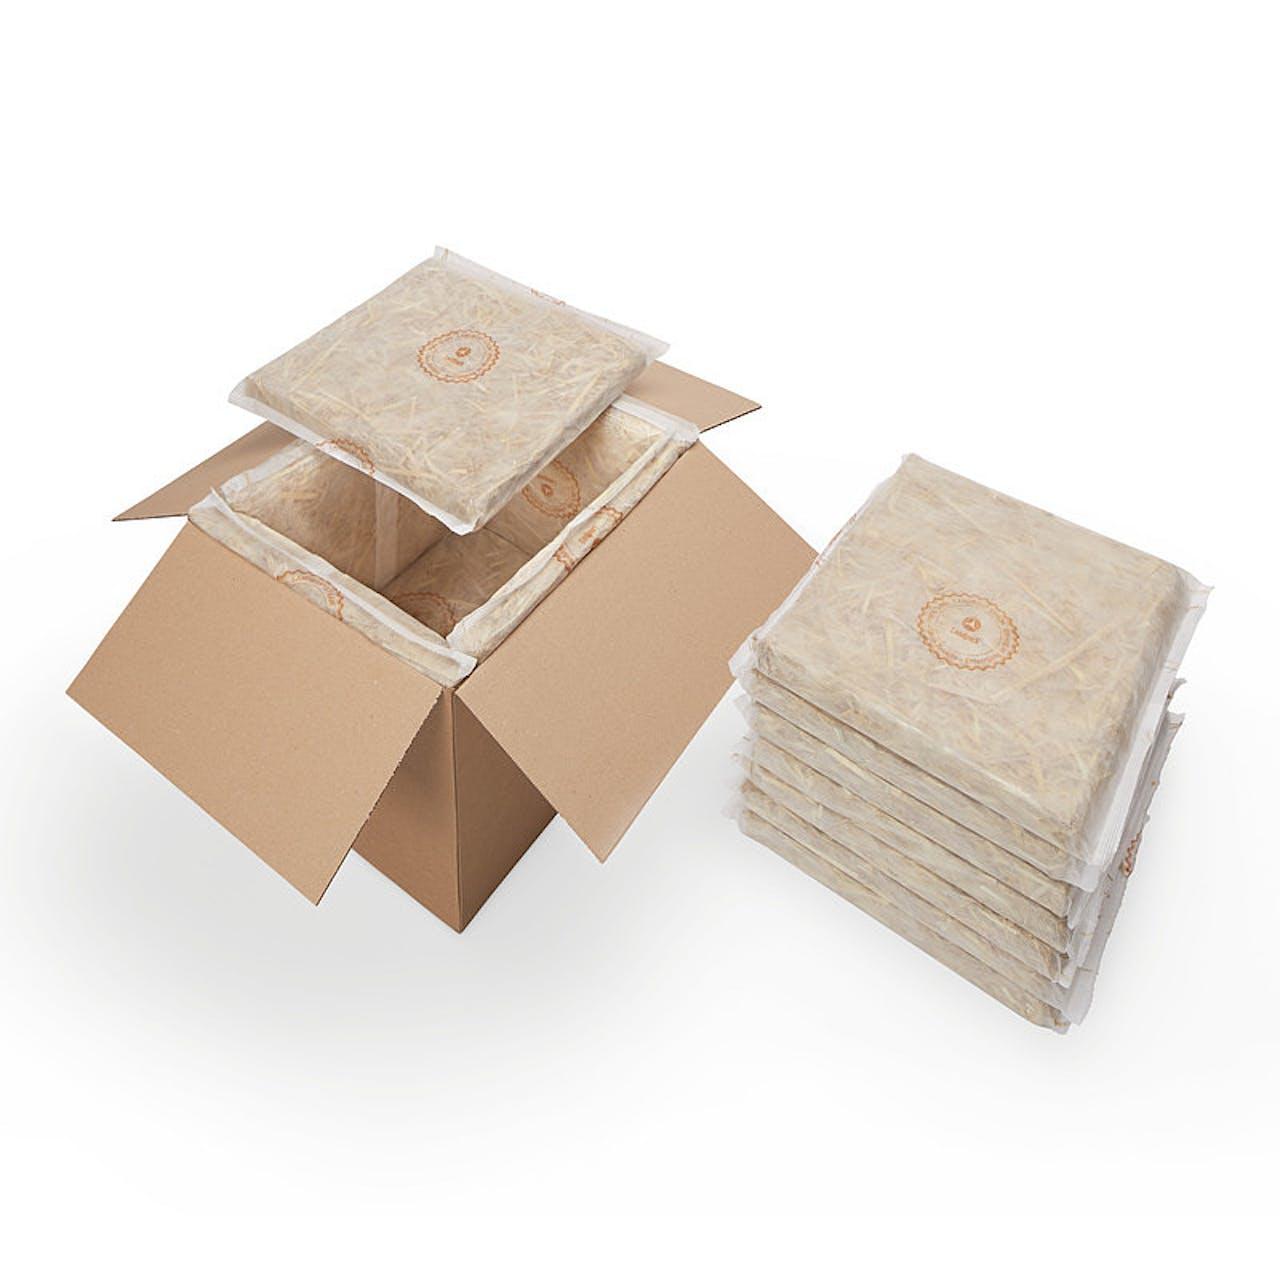 Thermobox aus Stroh - Landbox®